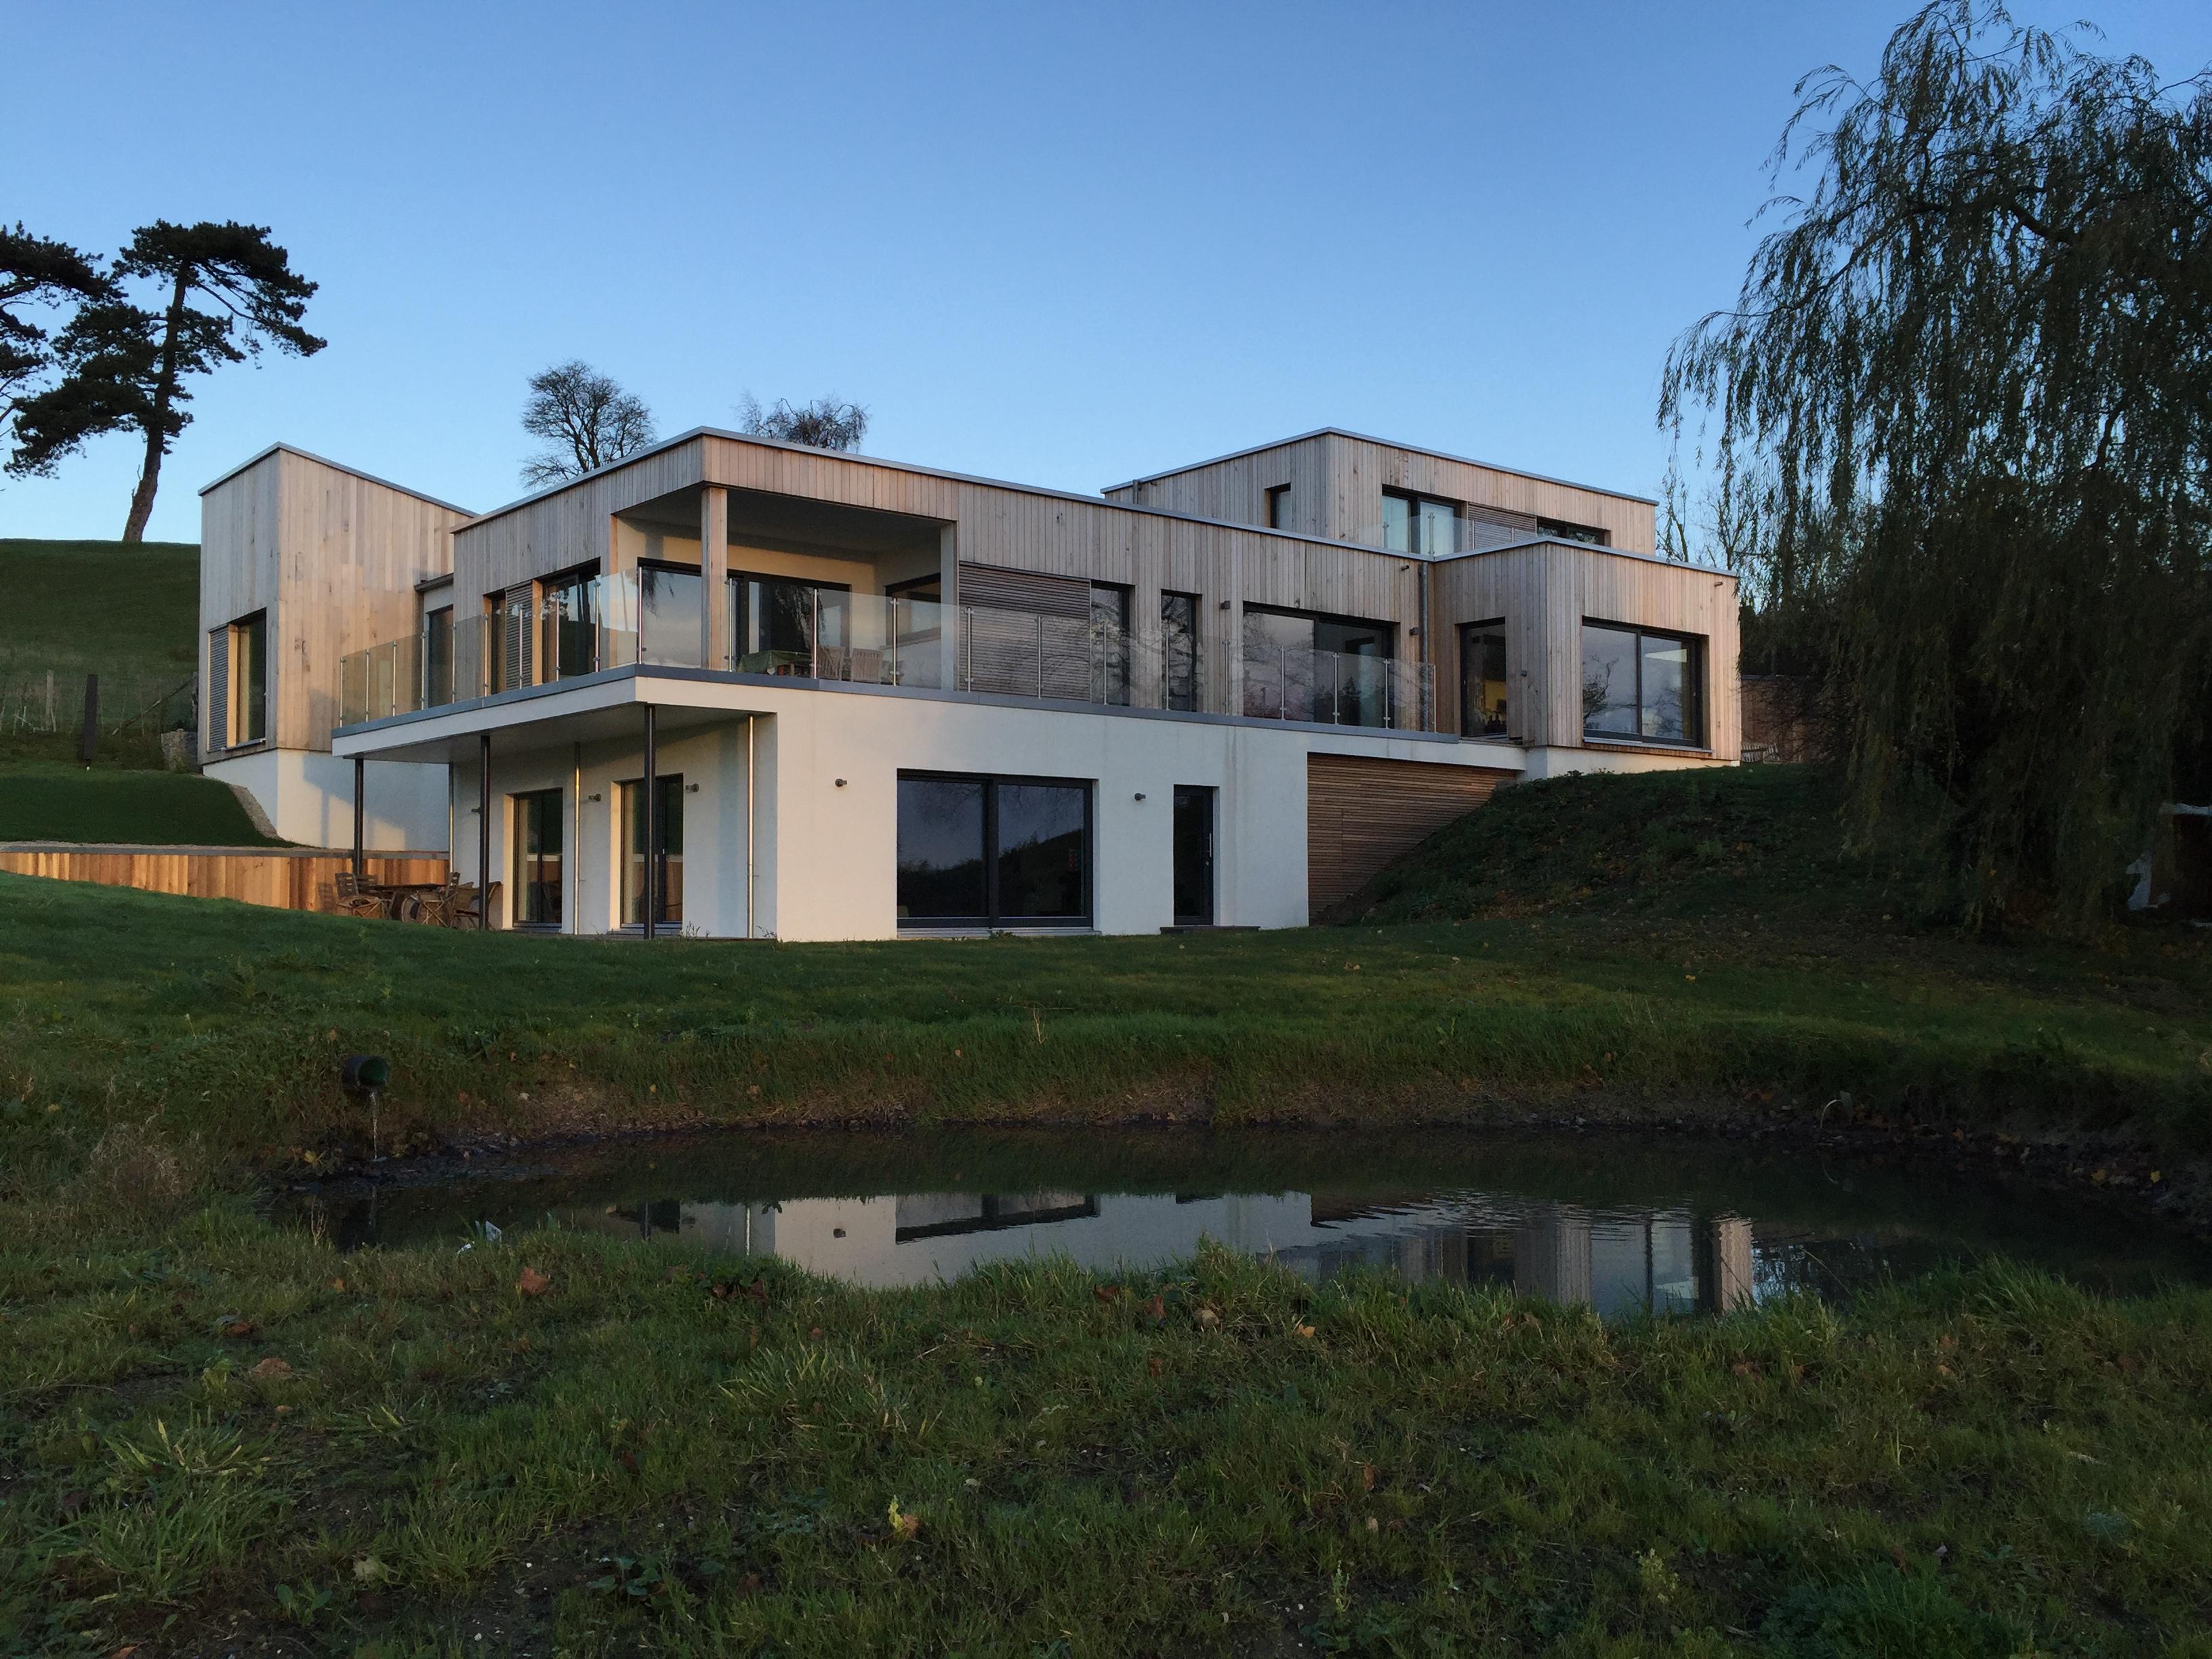 Concentus Haus Preise meisterstück-haus | holz-fertigbau architektenhäuser holz